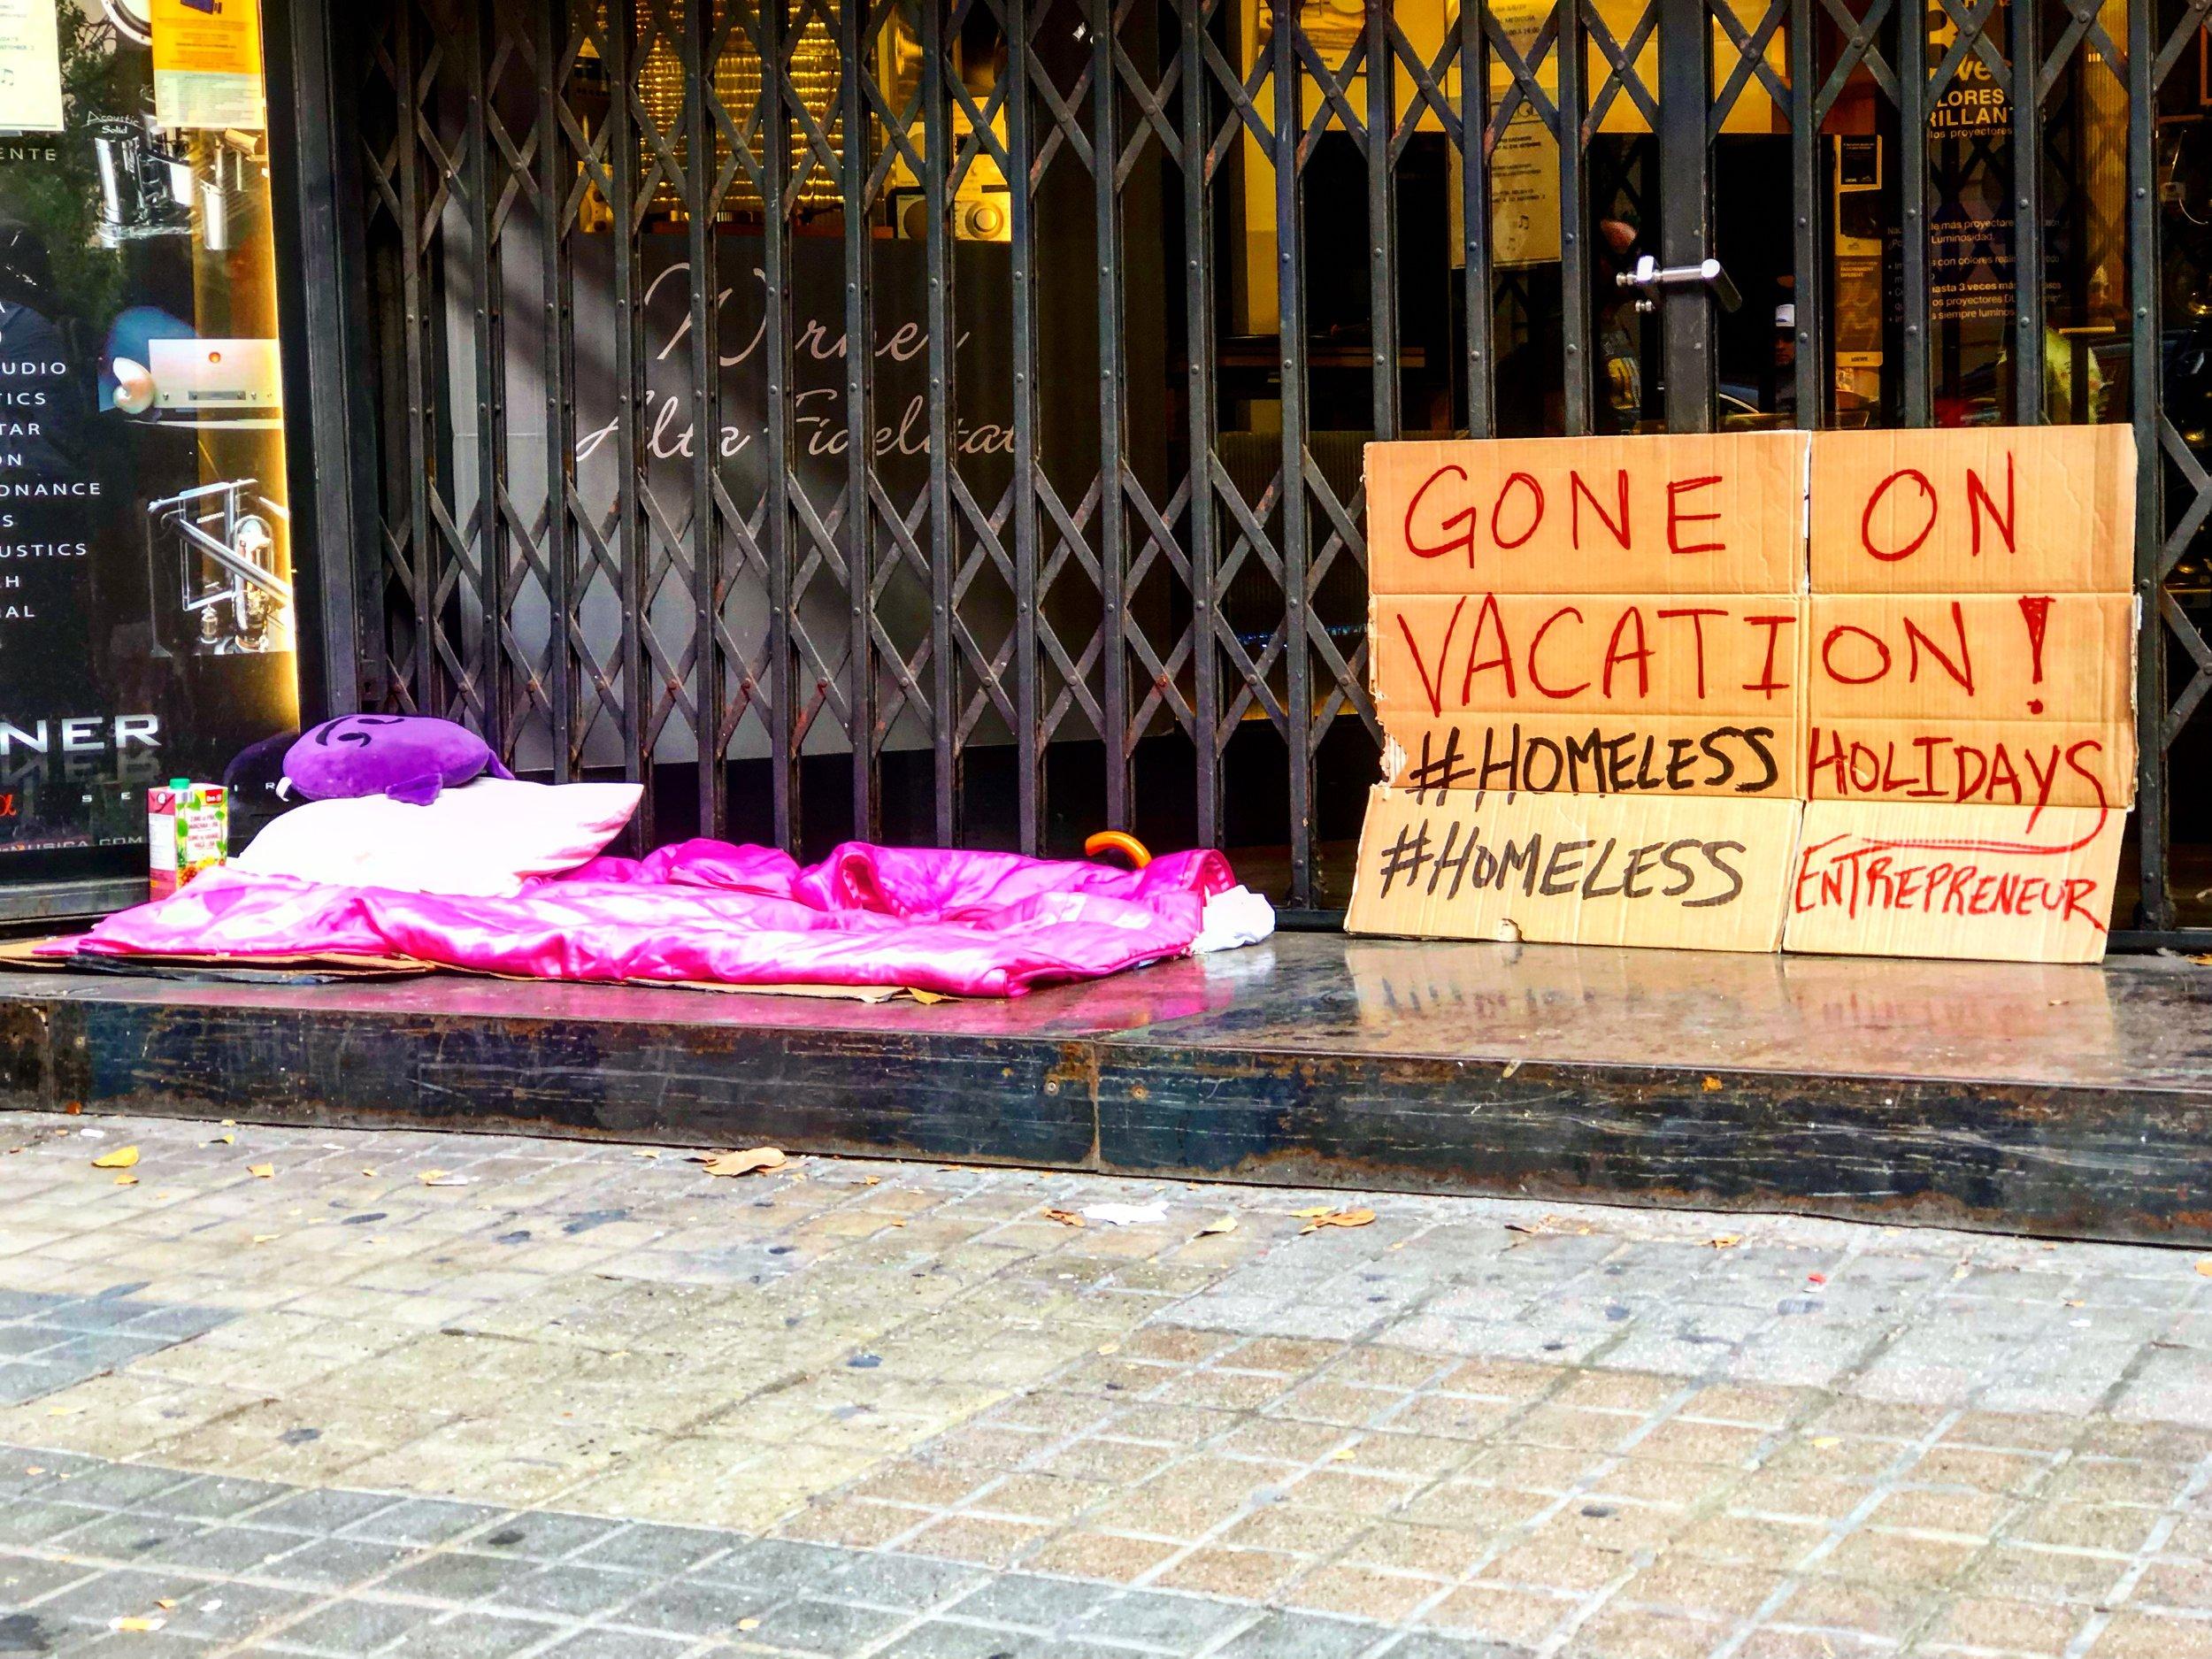 Gone on Vacation! #HomelessHolidays